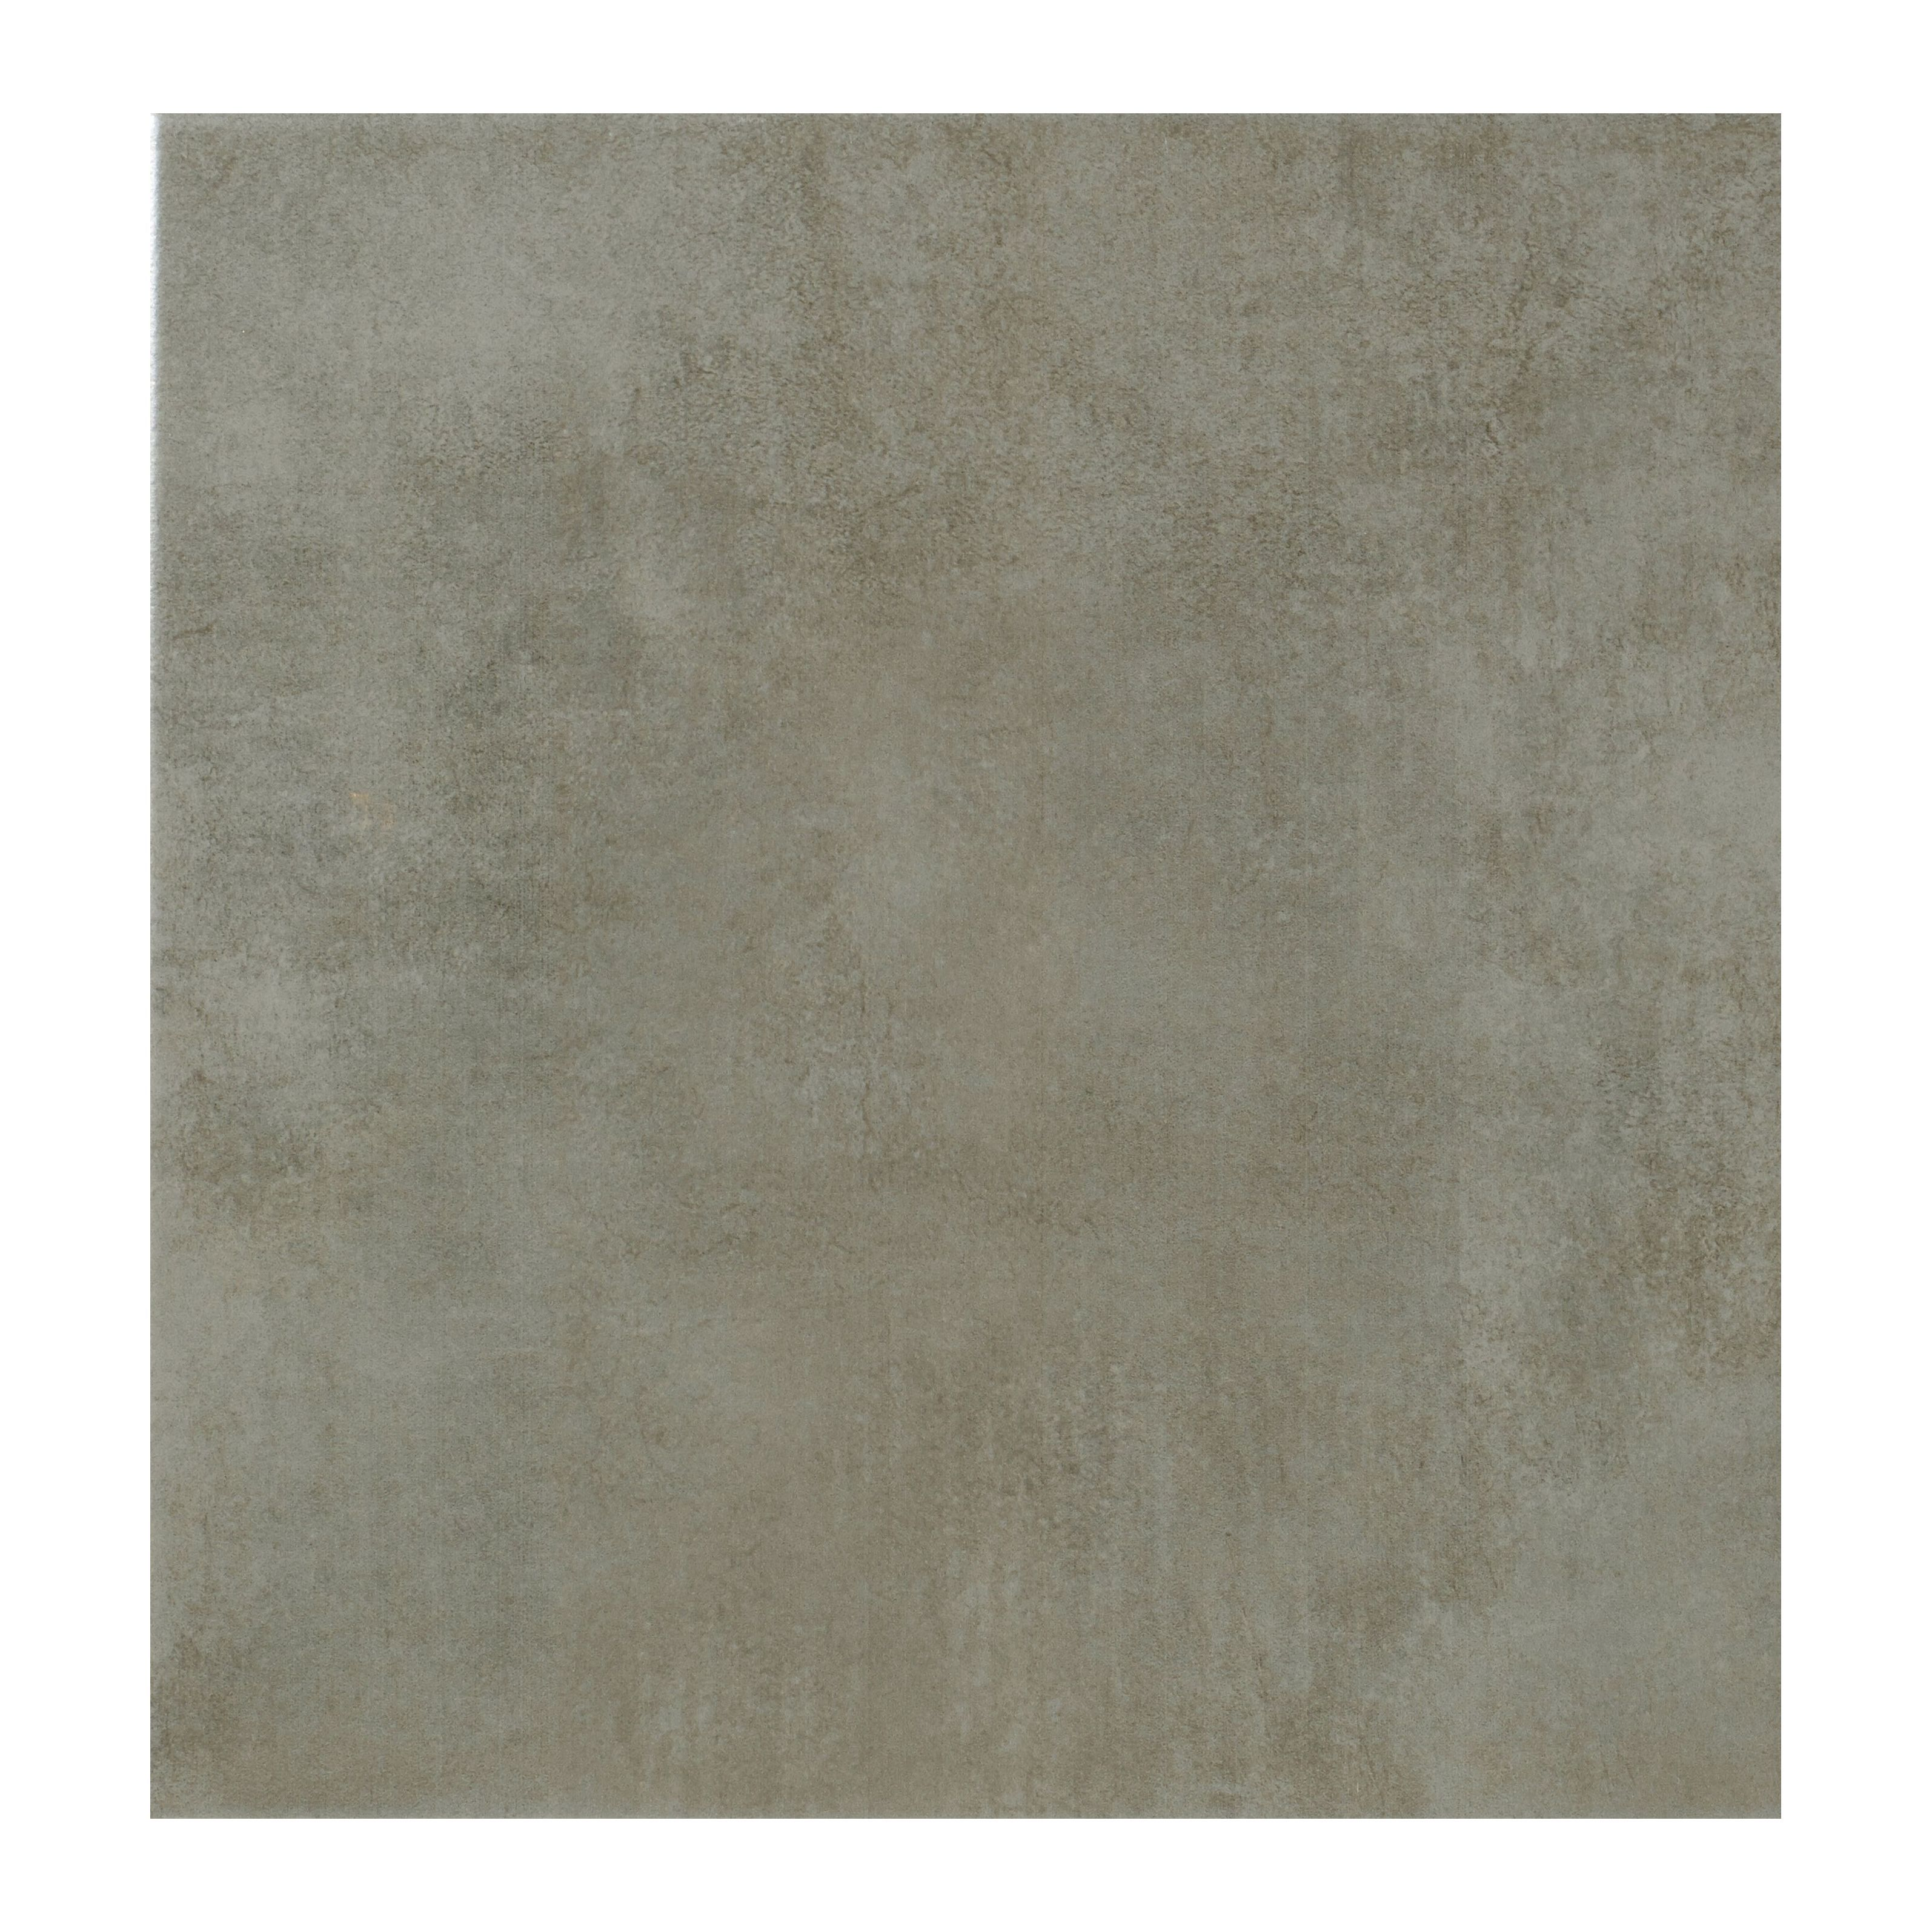 Lombardy Smoke Ceramic Floor Tile Pack Of 9 L 330mm W 330mm Departments Diy At B Q Ceramic Floor Tile Tile Floor Flooring